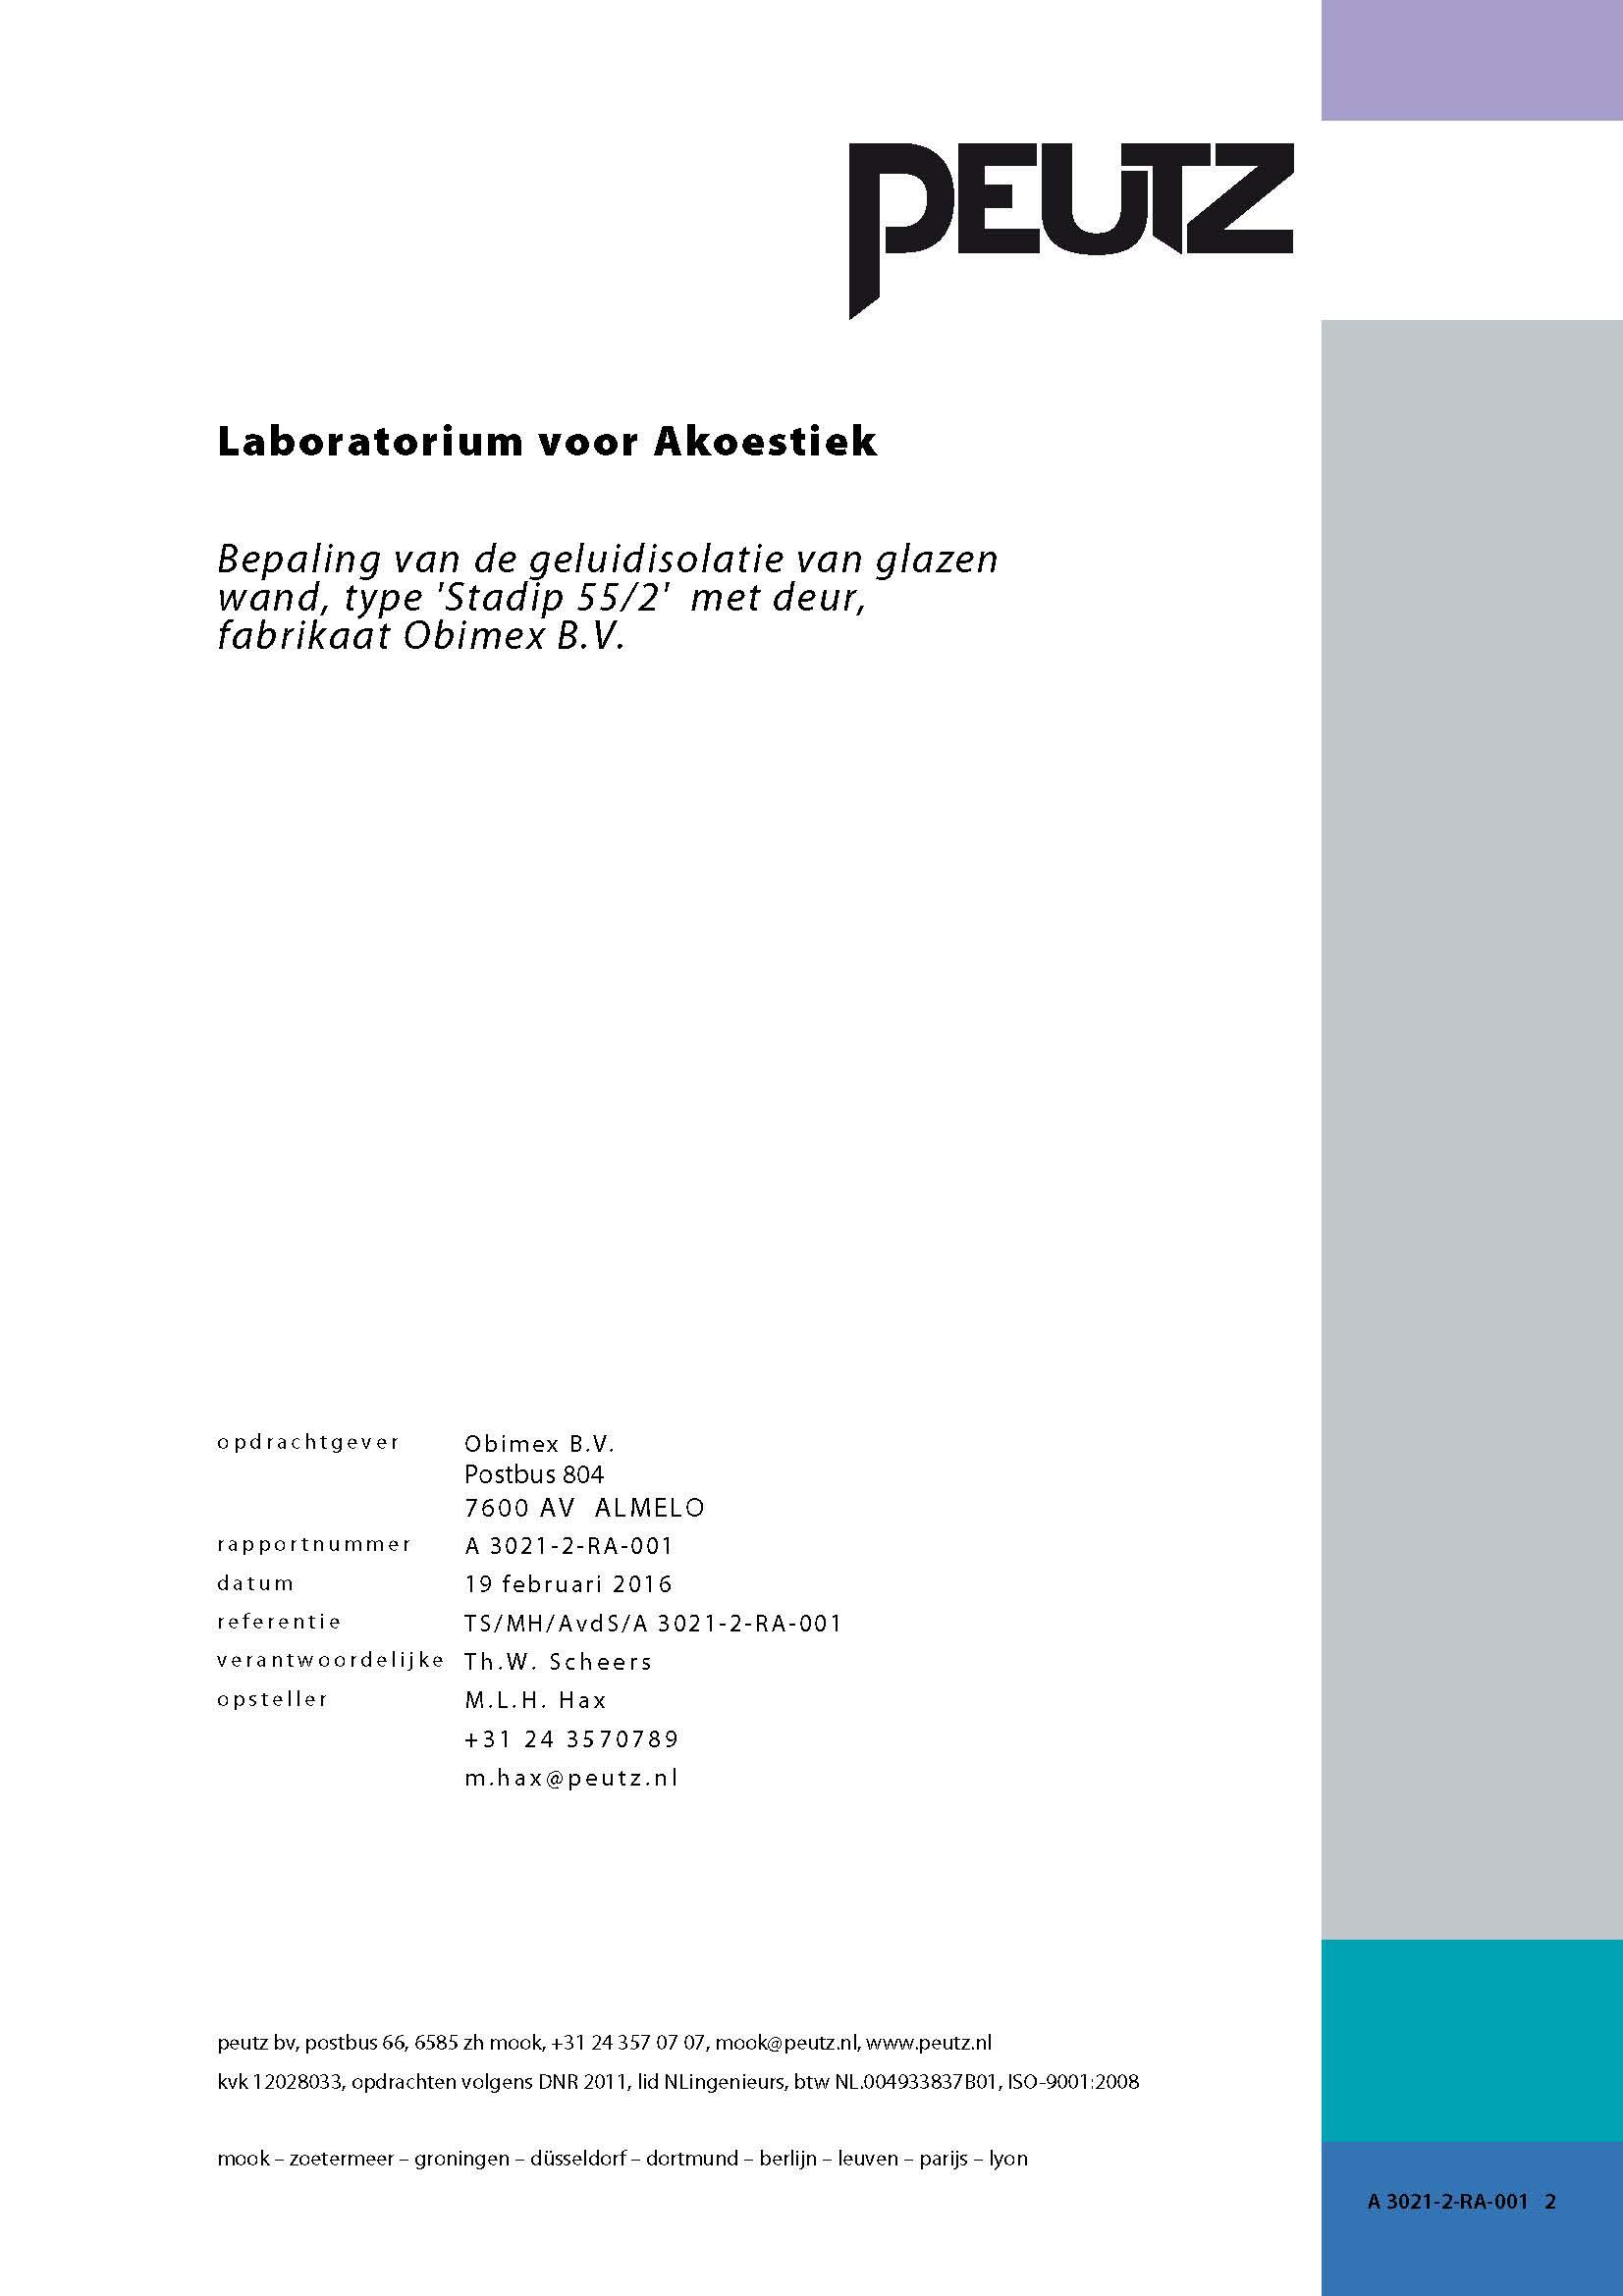 a-3021-2-ra-001-obi-600-volglaswand-55.2-met-hardglazen-deur-met-valdorpel-31-db_pagina_02